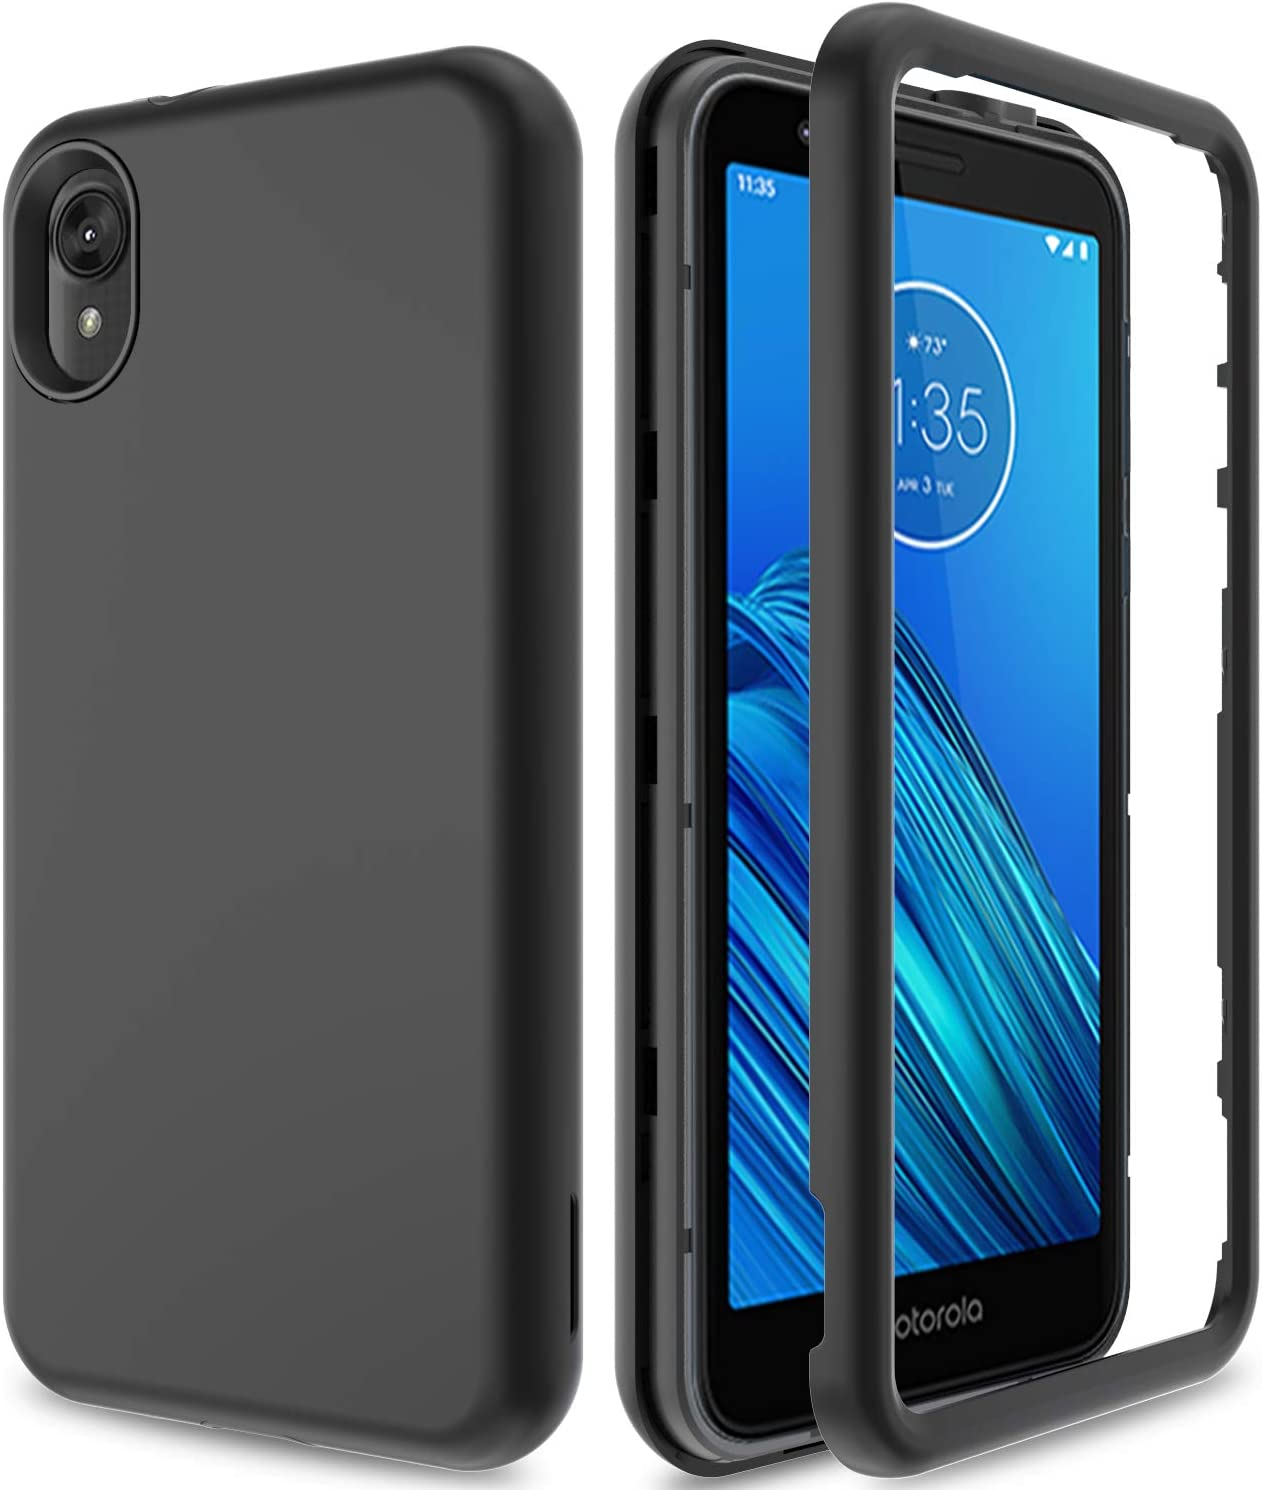 AMENQ Case for Motorola Moto E6, Moto XT2005DL Case, Three Layers Full Body Heavy Duty Shockproof TPU Bumper and PC Armor Hard Protective Phone Cover for Moro E 6th Gen 5.5 2019 (Black)